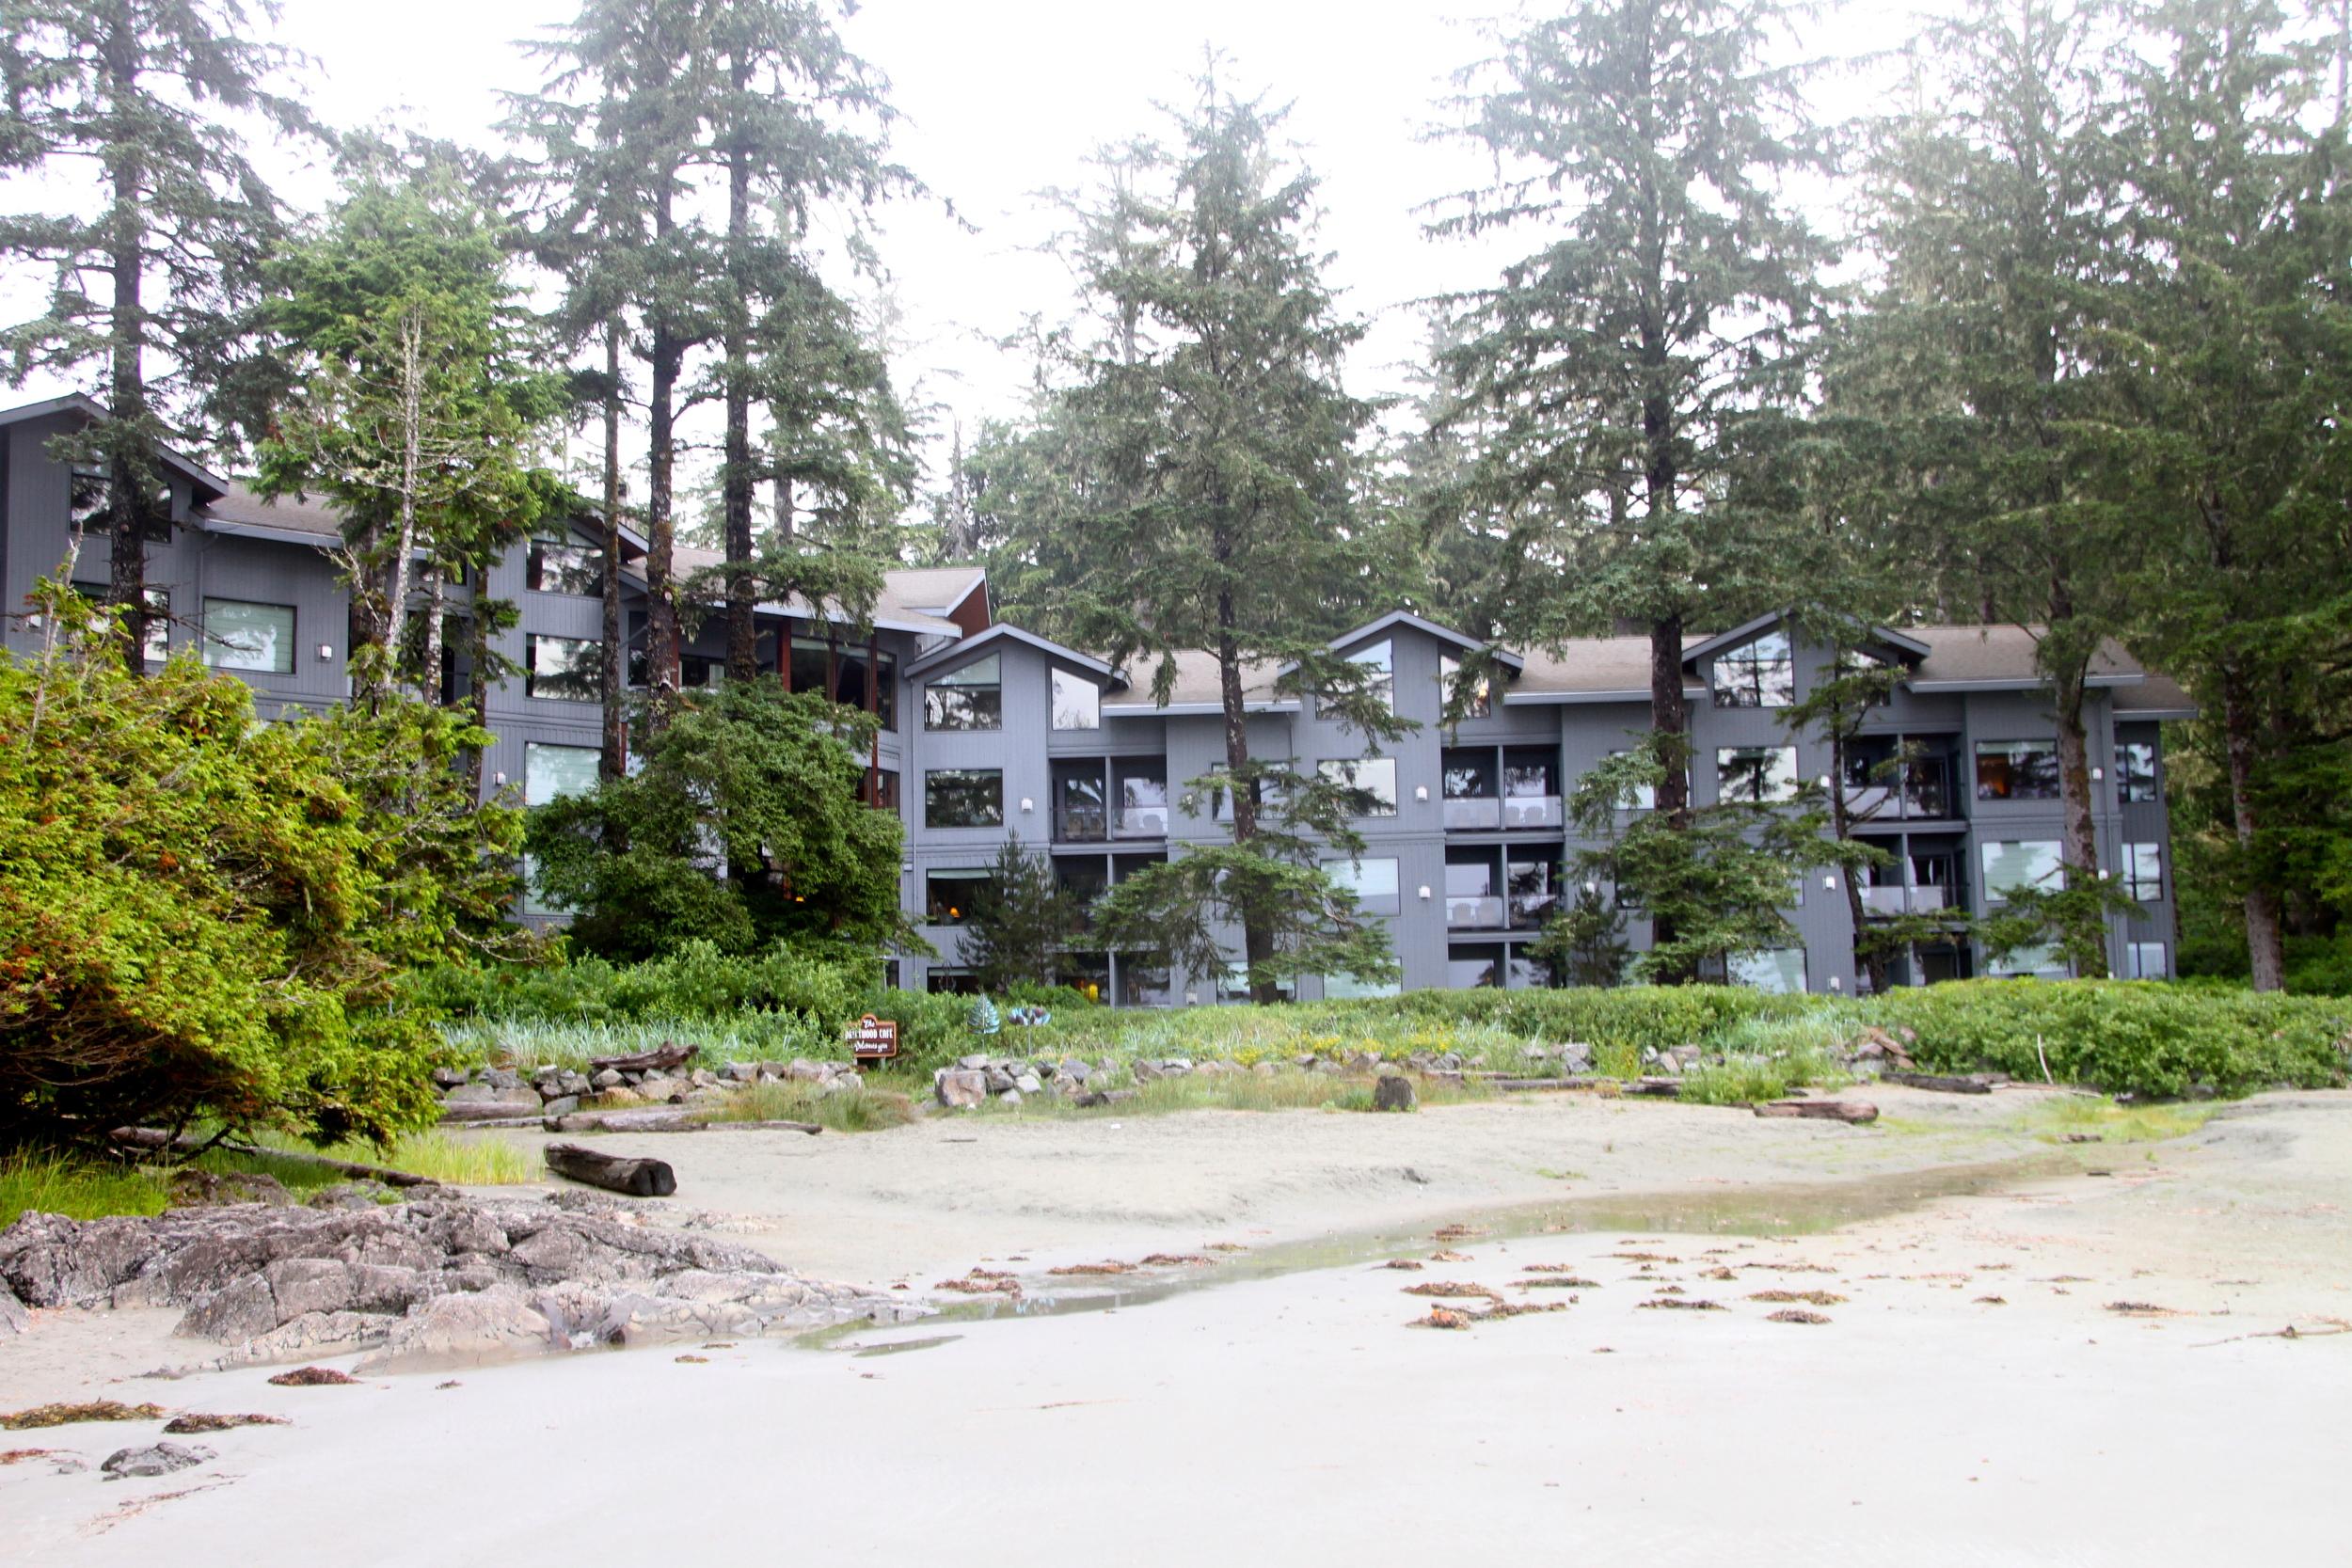 The Wickaninnish Inn, Tofino, BC, Canada.